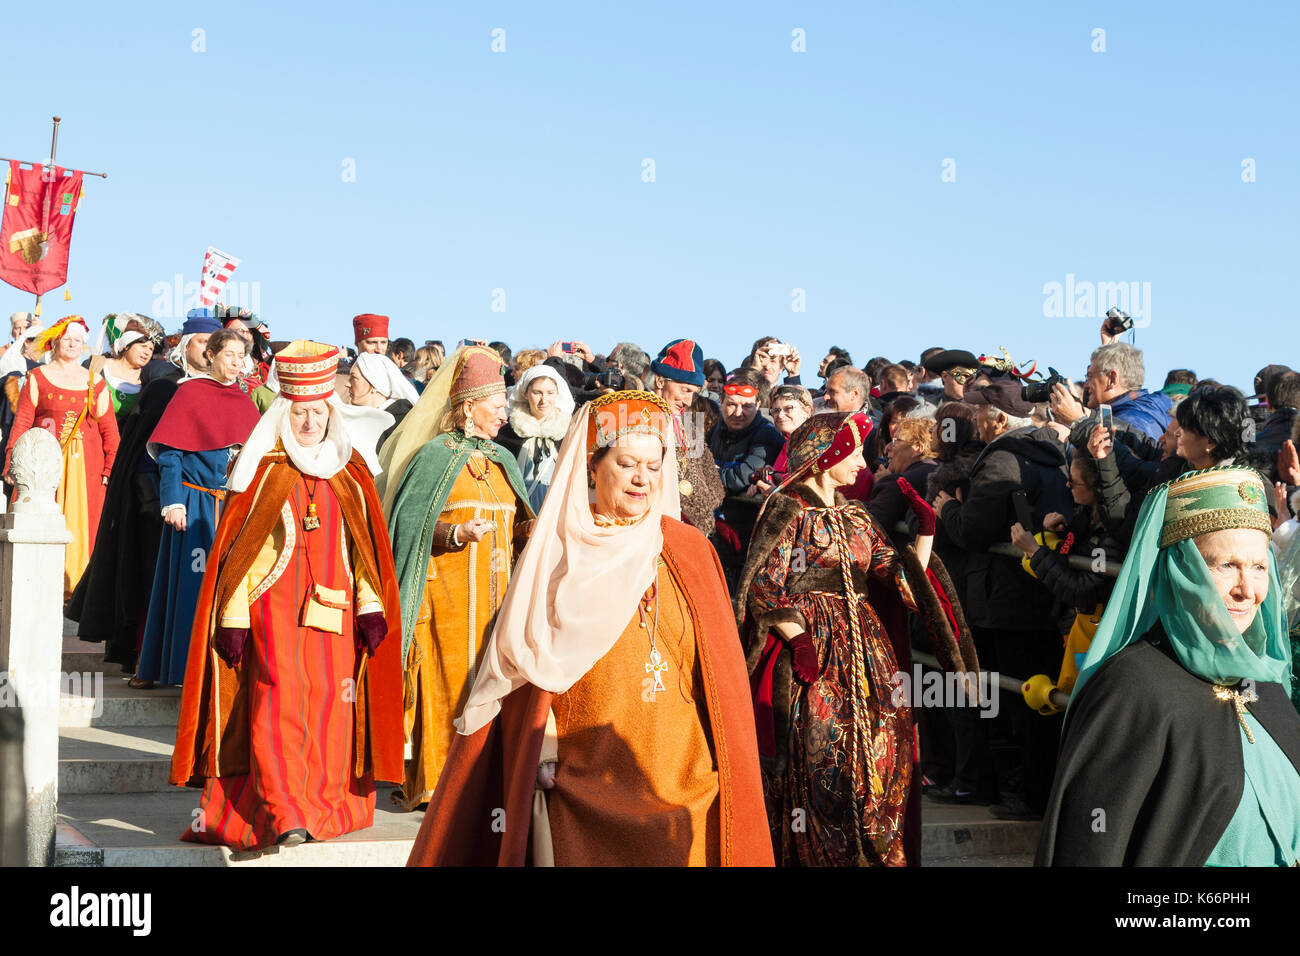 18 Feb 2017 Venice, Italy. Venetians dressed as aristocrats in colorful historic costumes in  the Festa della Maries - Stock Image